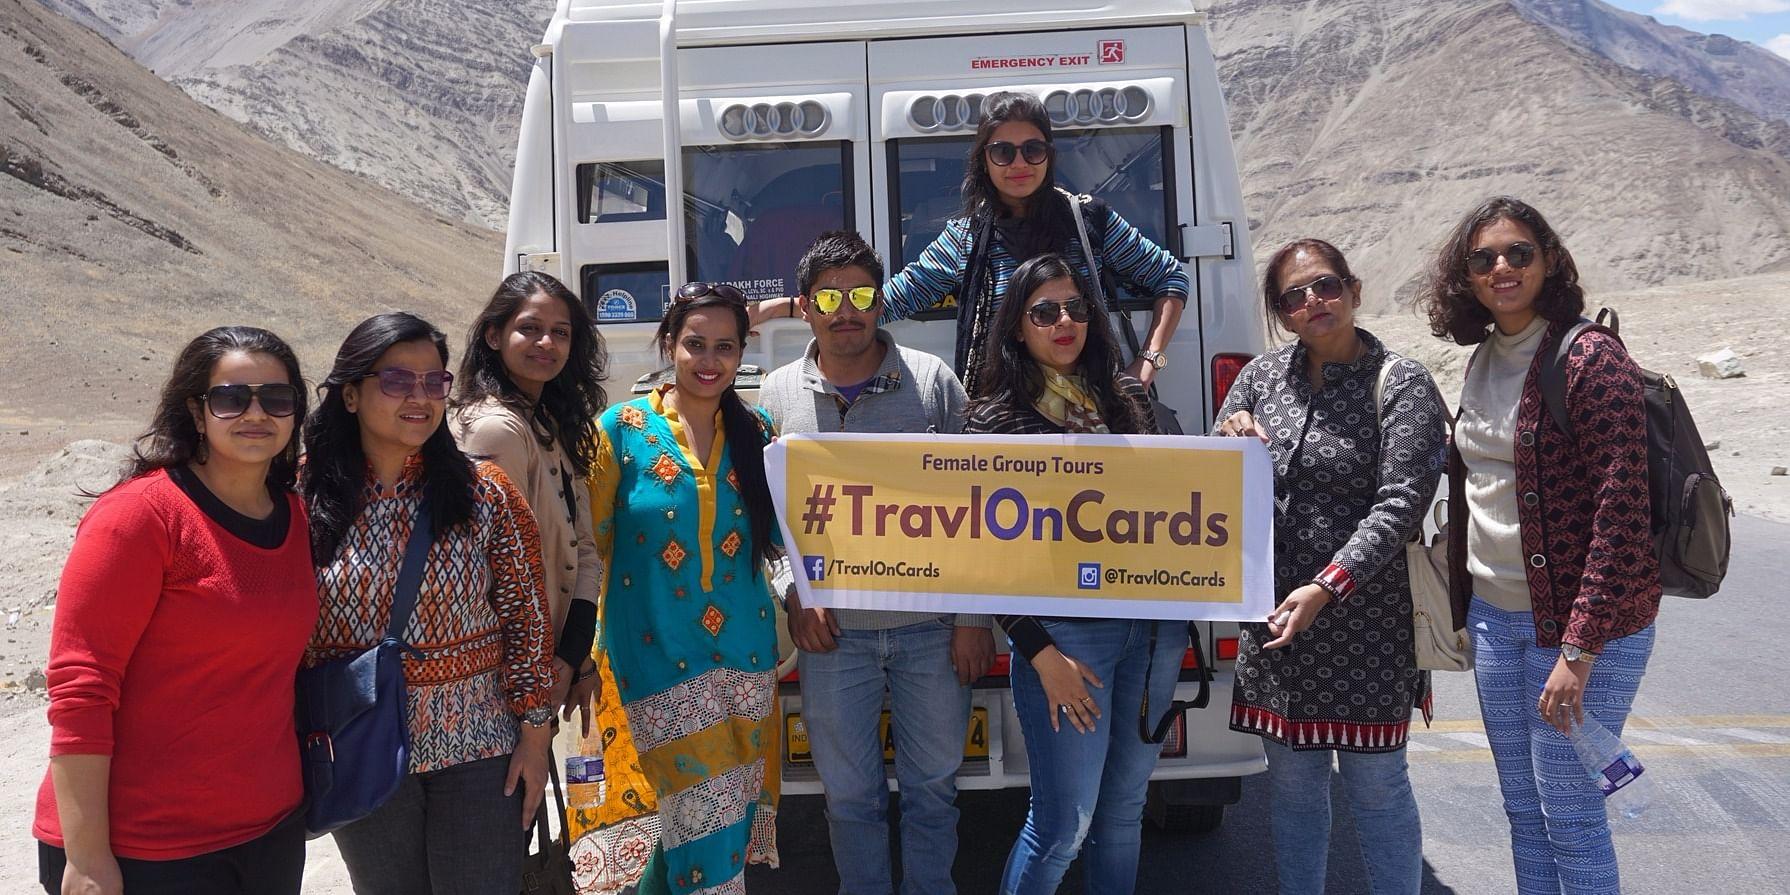 A stil from&nbsp;<b>TravlOnCards </b>&nbsp;Women Group Tour To Leh Ladakh &nbsp;in May 2016.